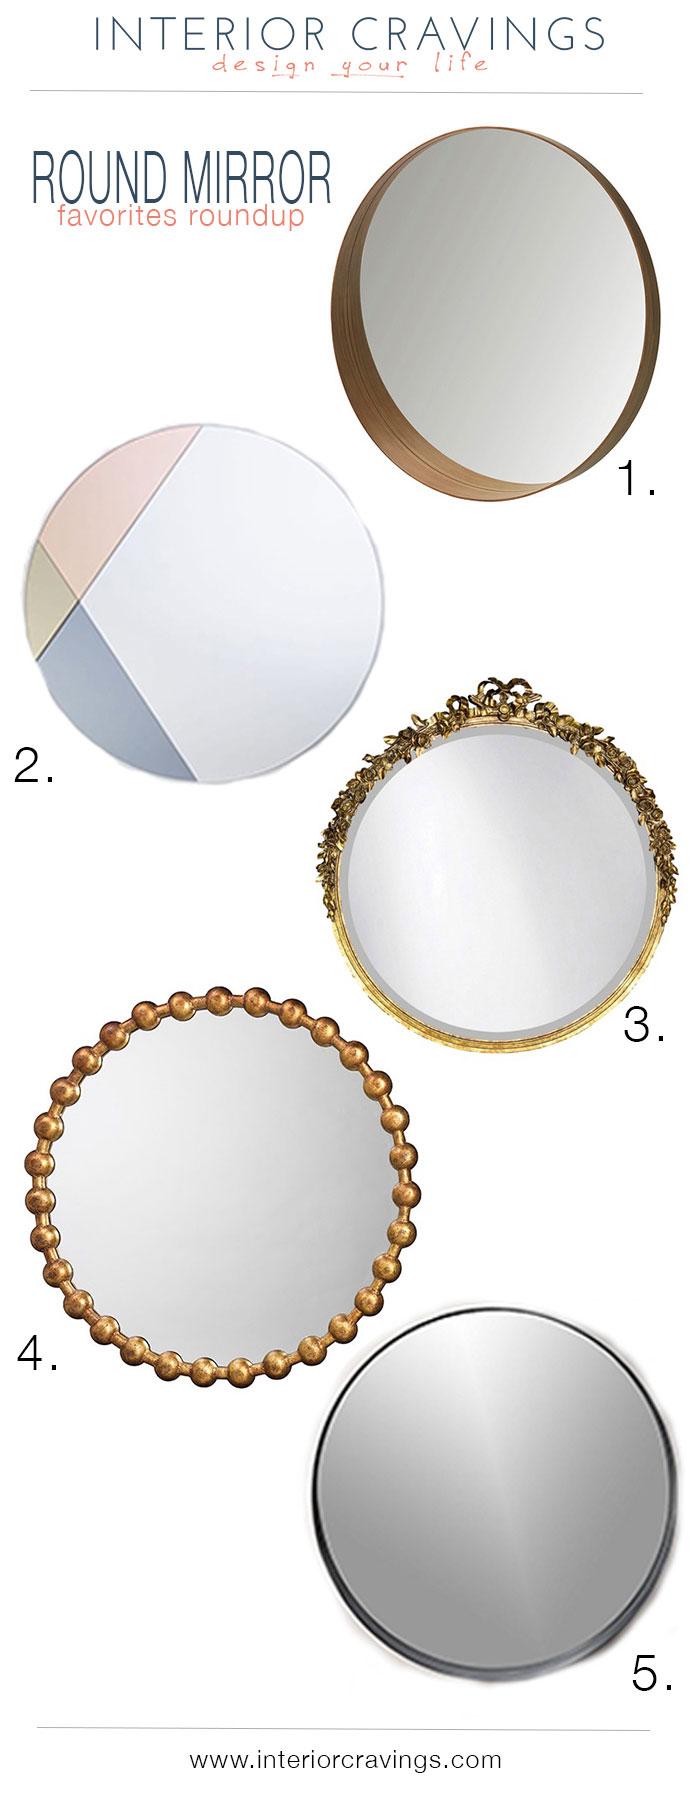 round-mirror-round-up-5-favorites-interior-cravings